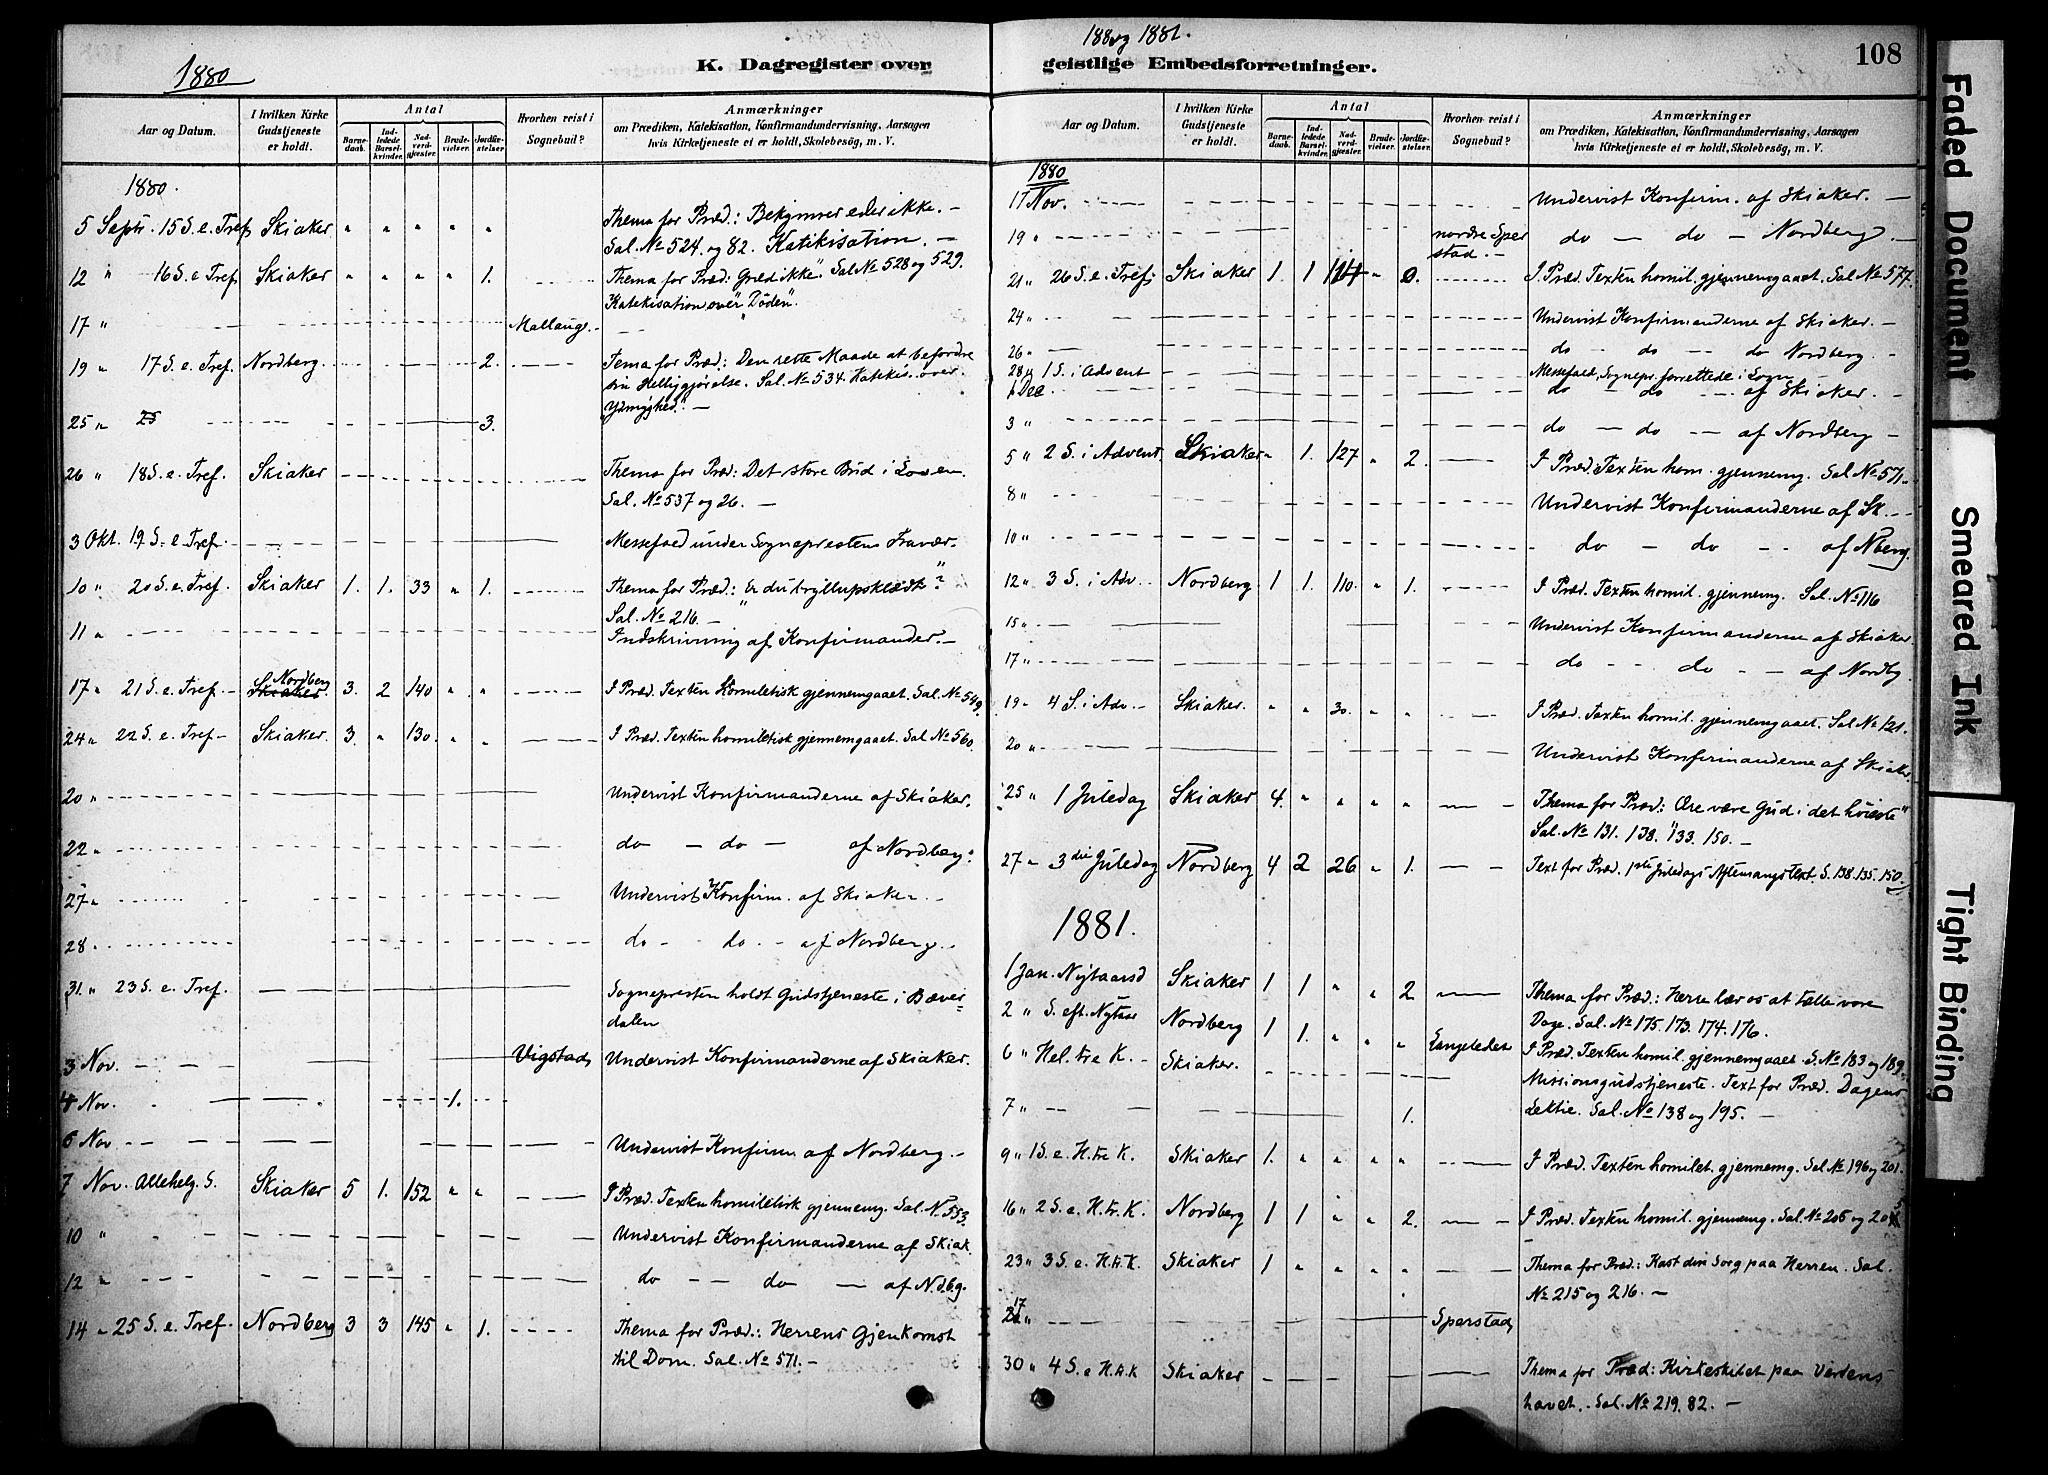 SAH, Skjåk prestekontor, Ministerialbok nr. 2, 1878-1907, s. 108